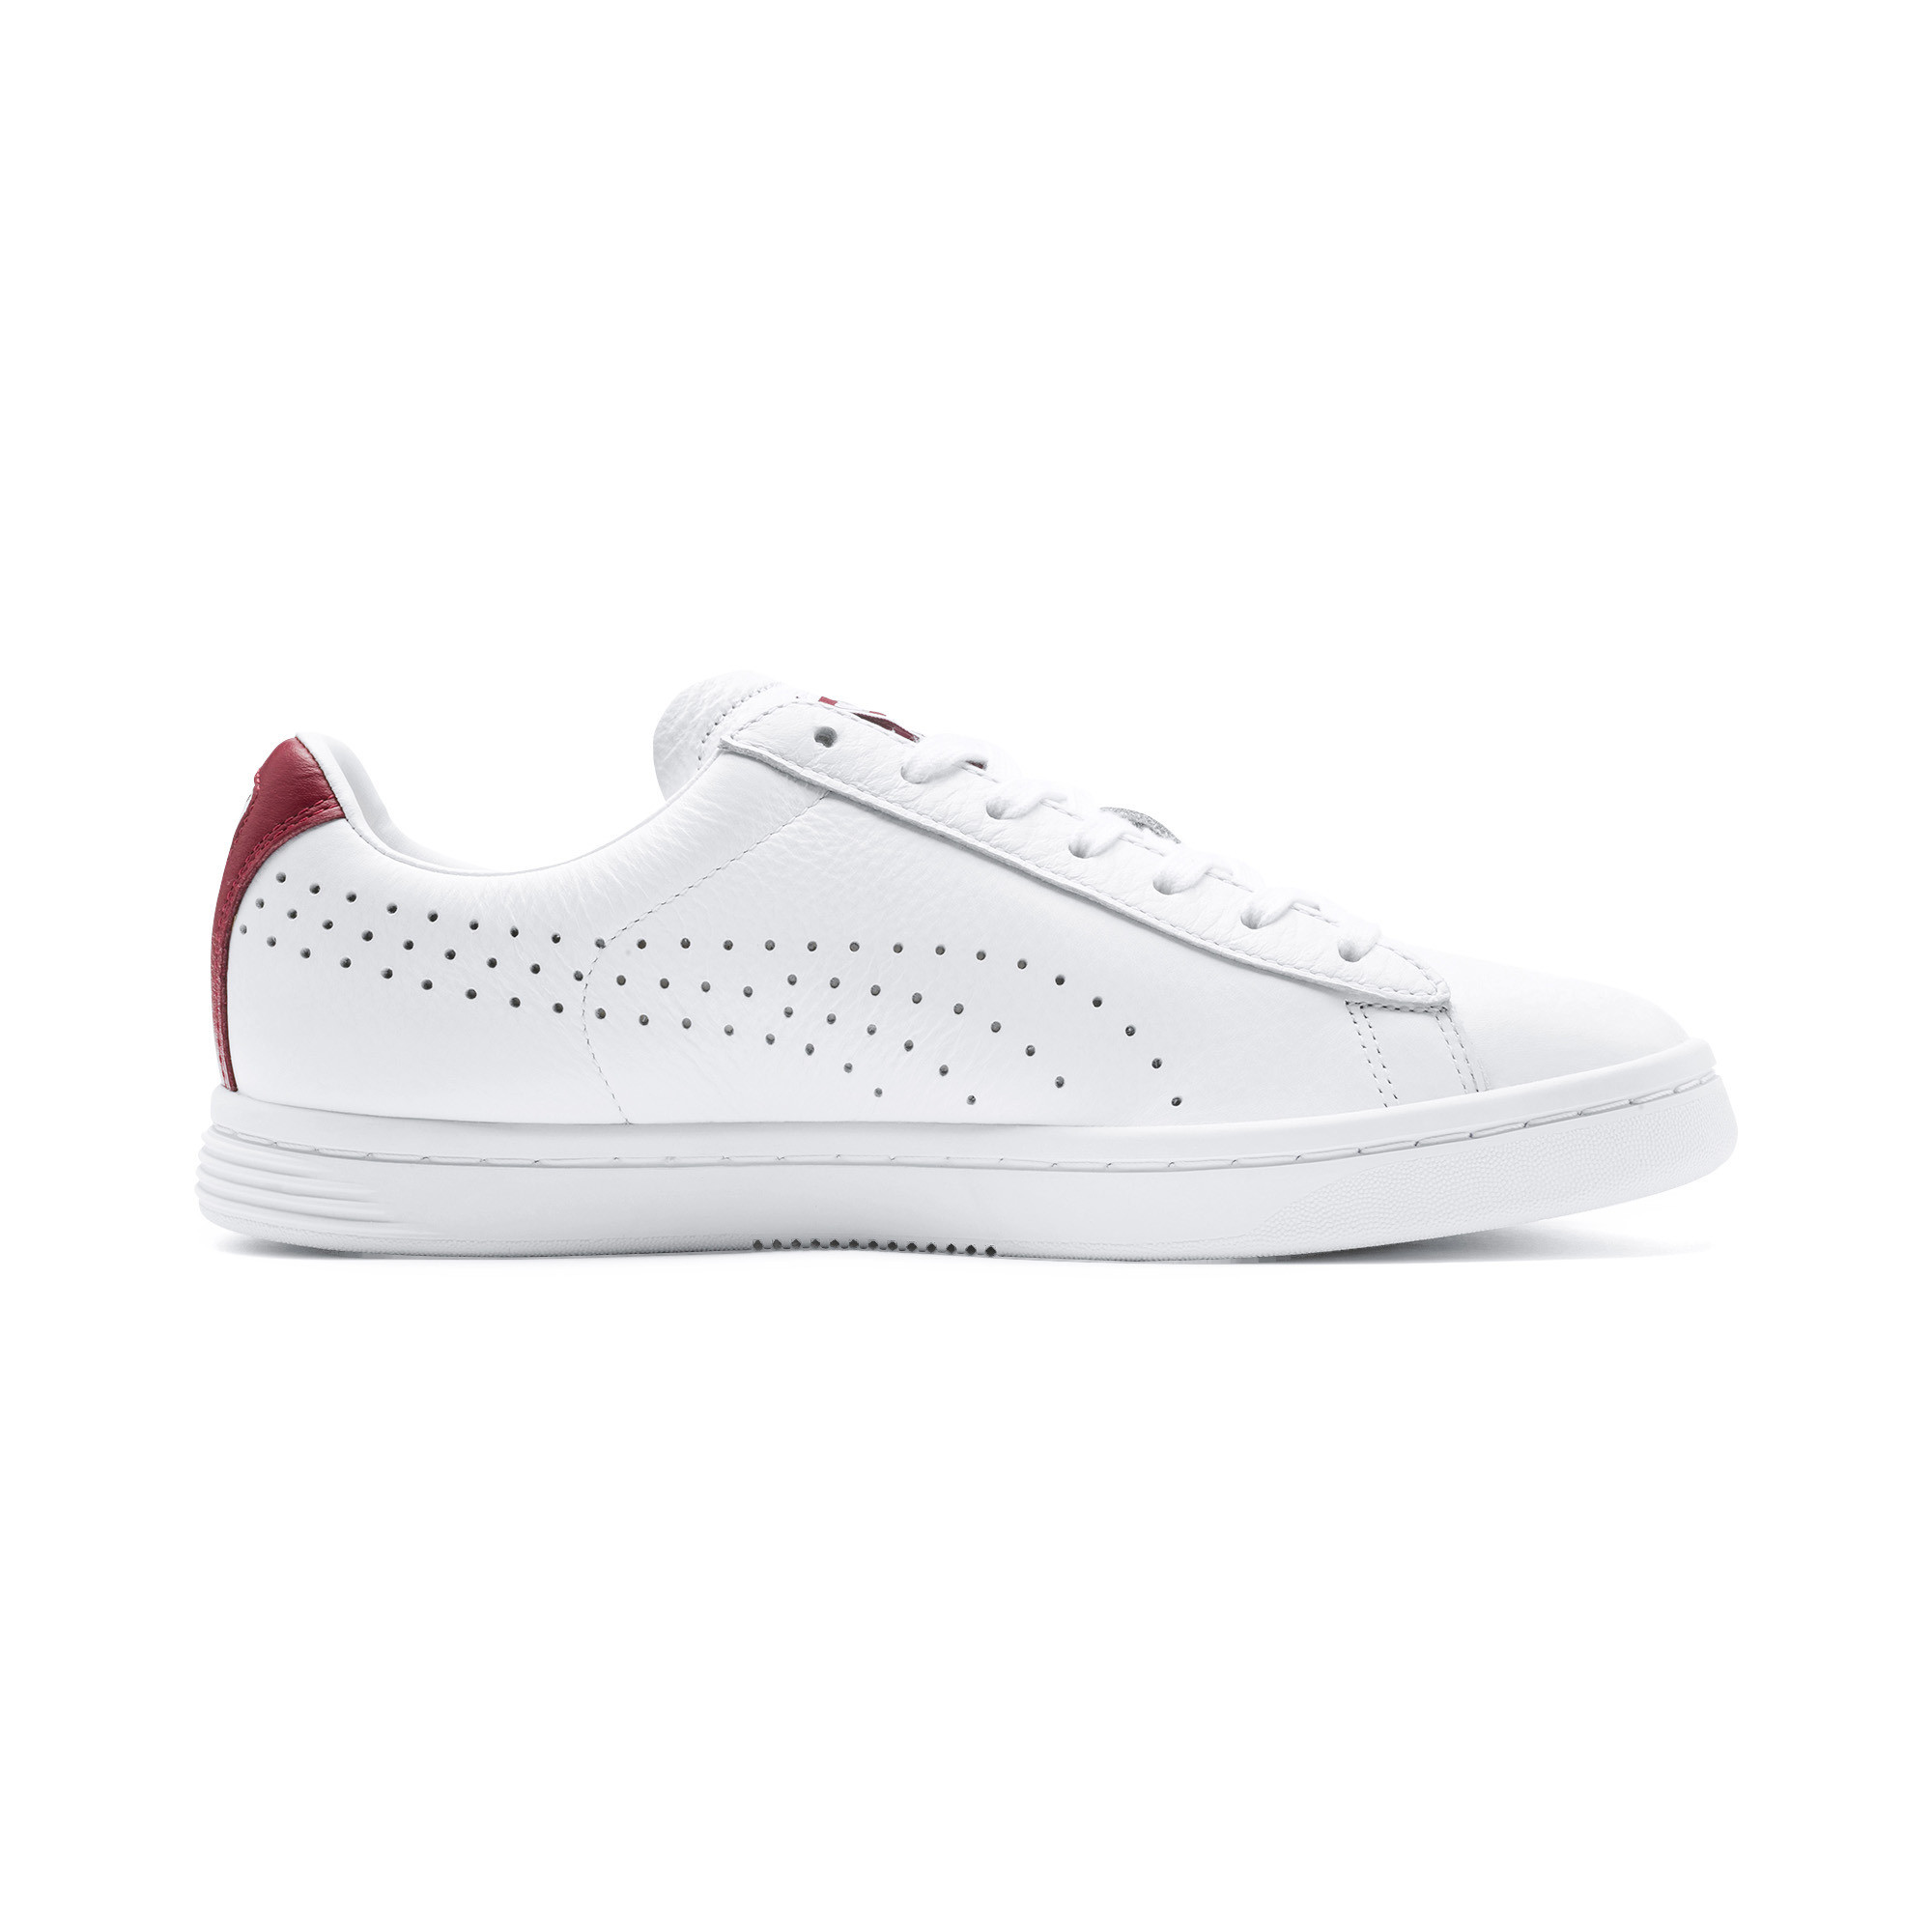 PUMA-Court-Star-Men-039-s-Sneakers-Unisex-Shoe-Sport-Classics thumbnail 14